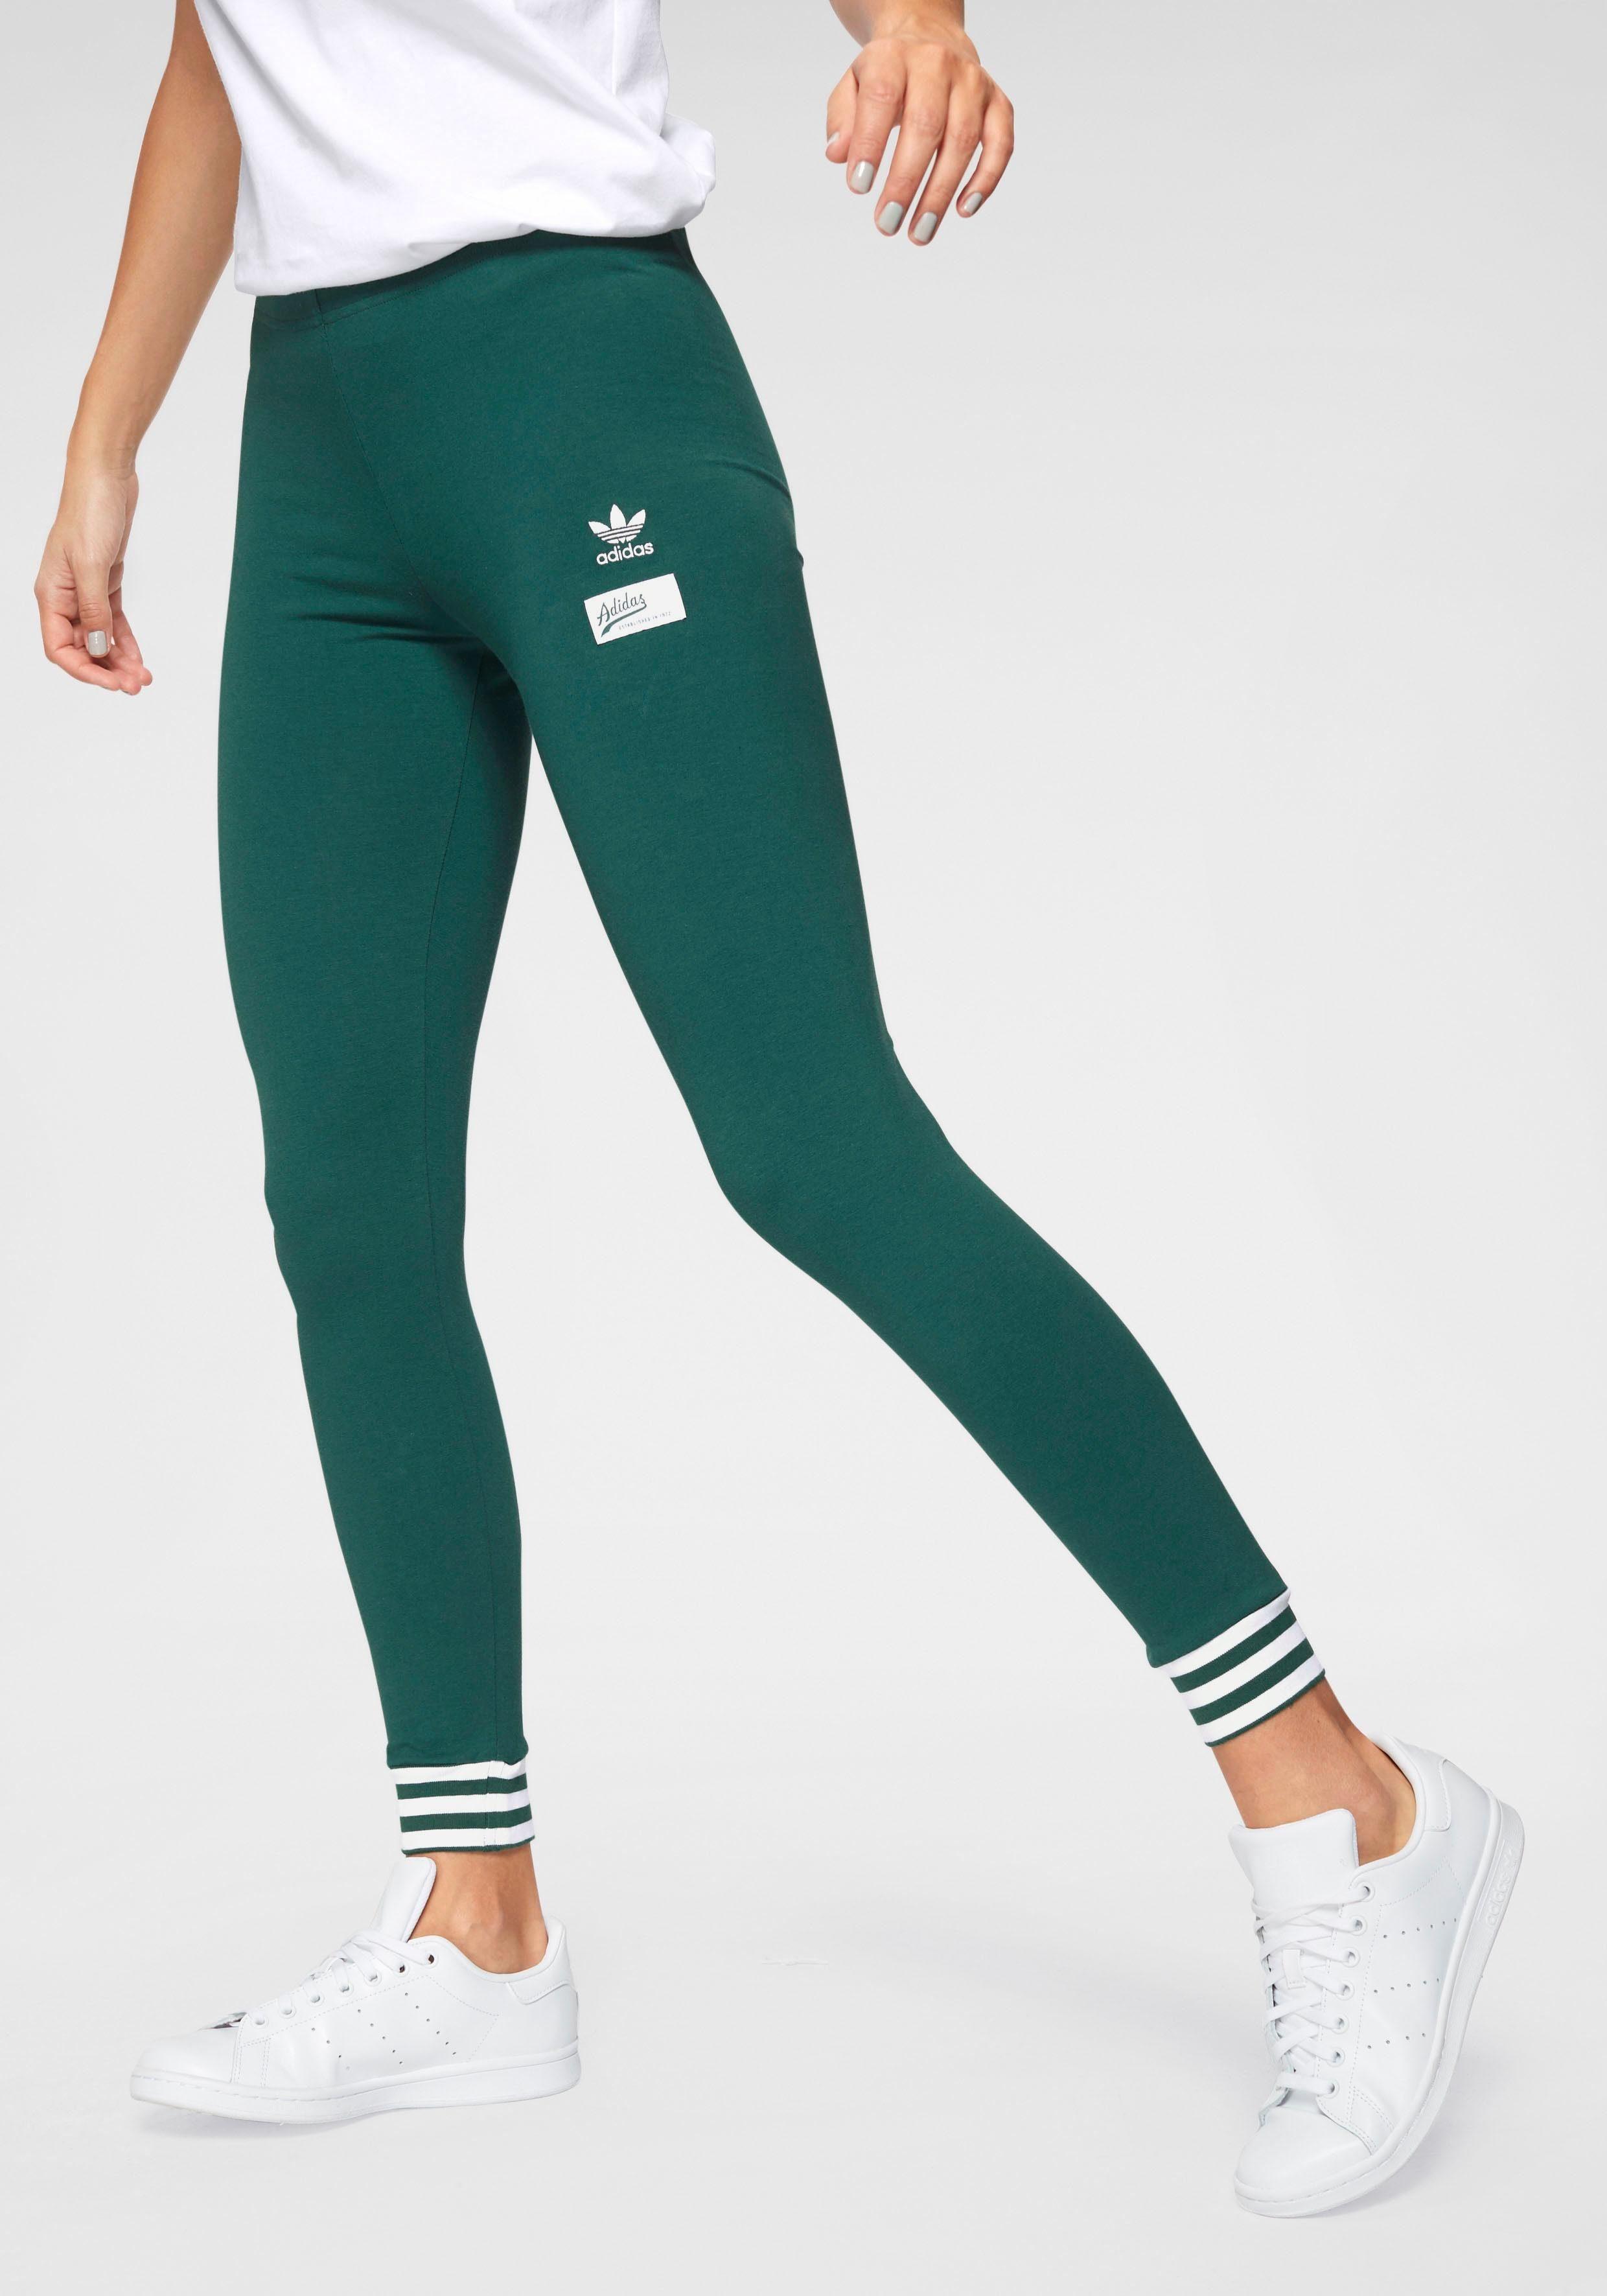 Originals Adidas Afbeeldingsbron Adidas »tights« Adidas »tights« Originals Afbeeldingsbron Legging Afbeeldingsbron Originals Legging »tights« Legging nqz0xIC